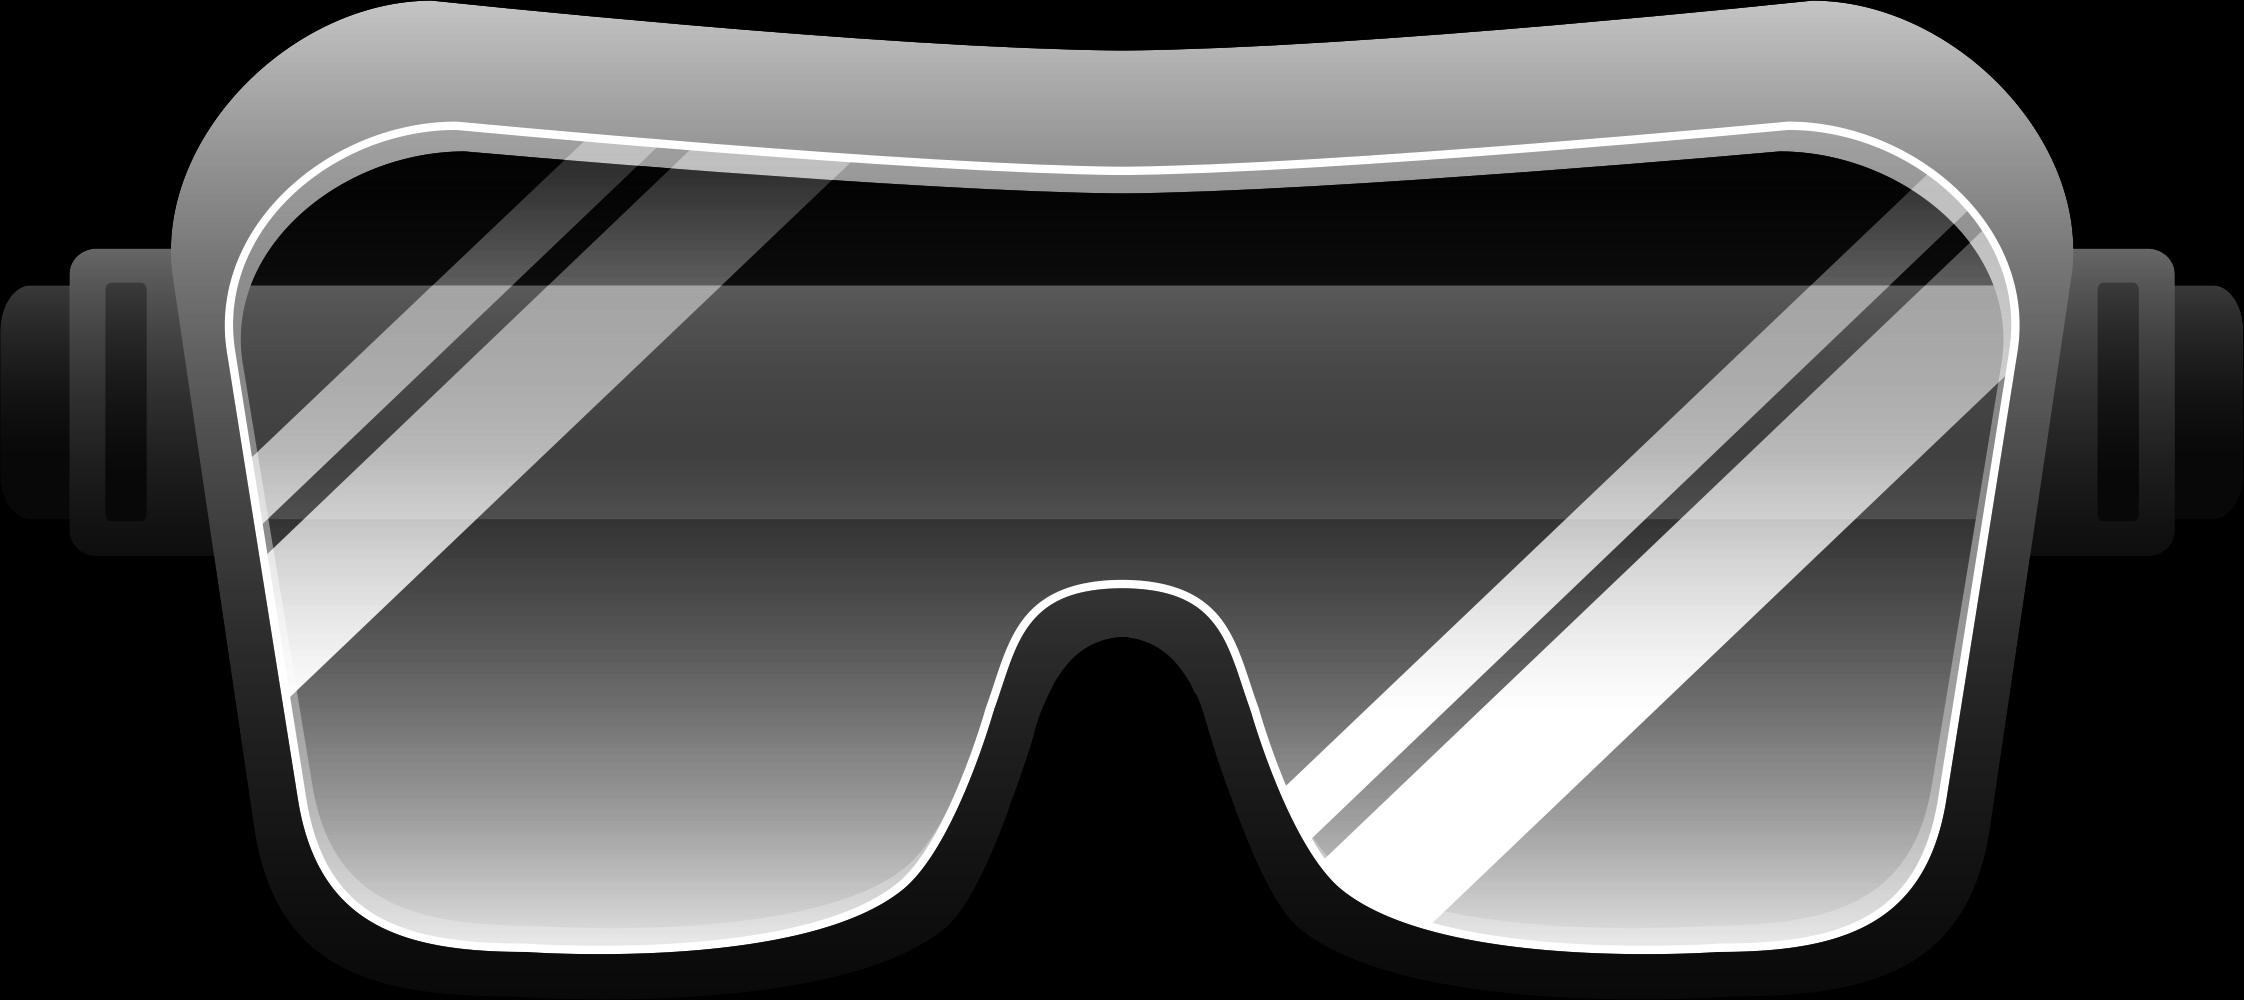 Sunglasses clipart clip art. Goggles eye protection glasses